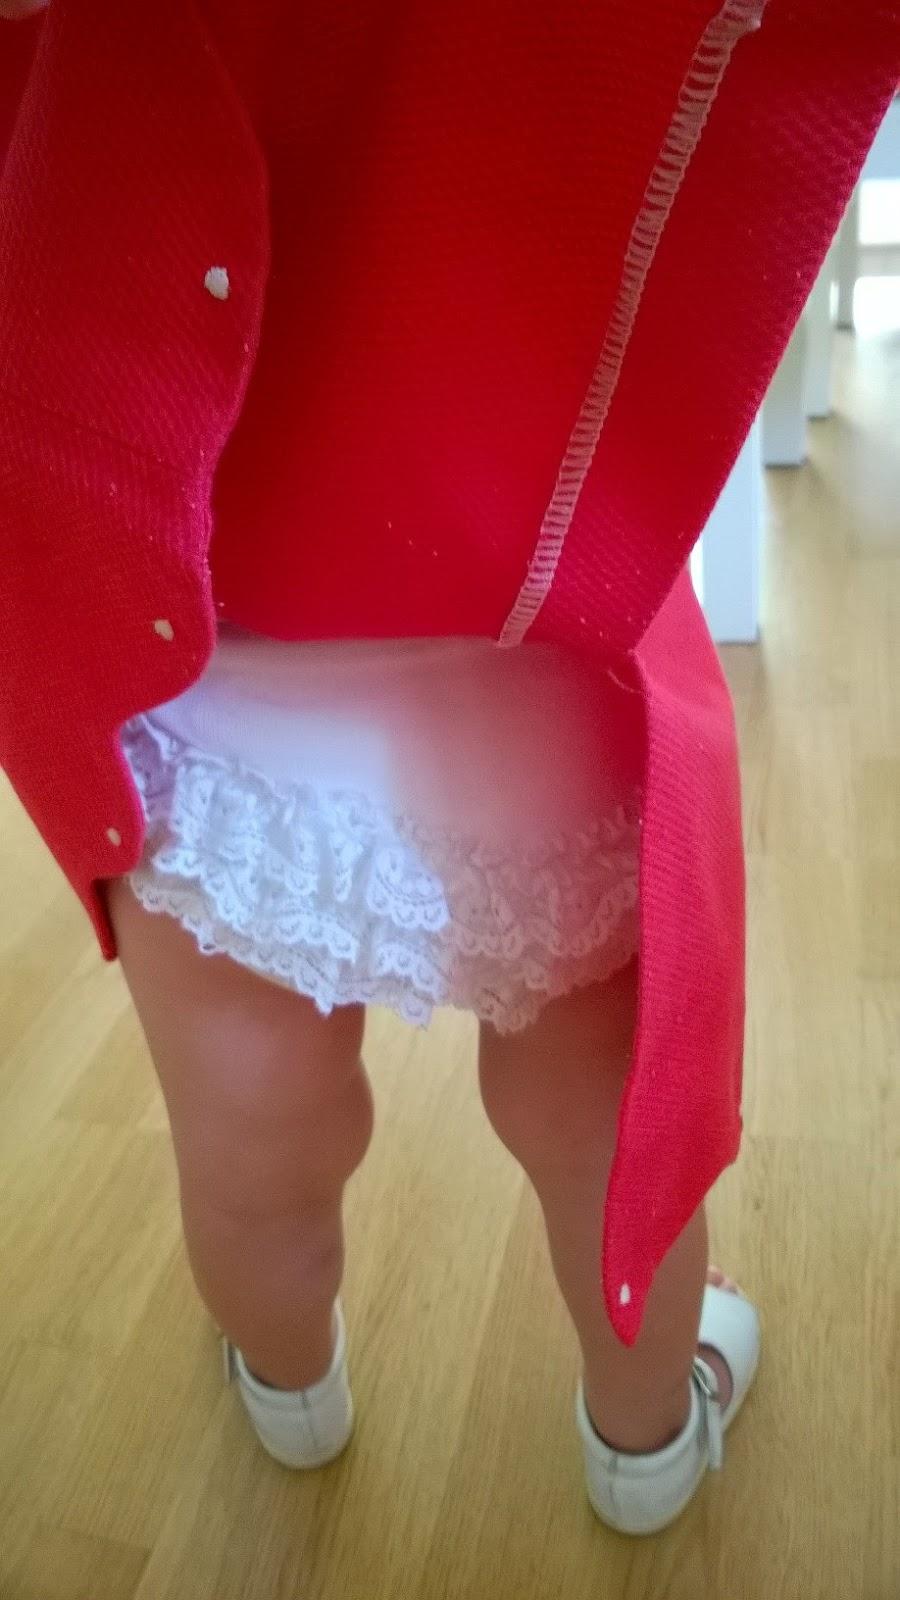 imagenes de niños en ropa interior - CiberGijón MODA INFANTIL Telecable